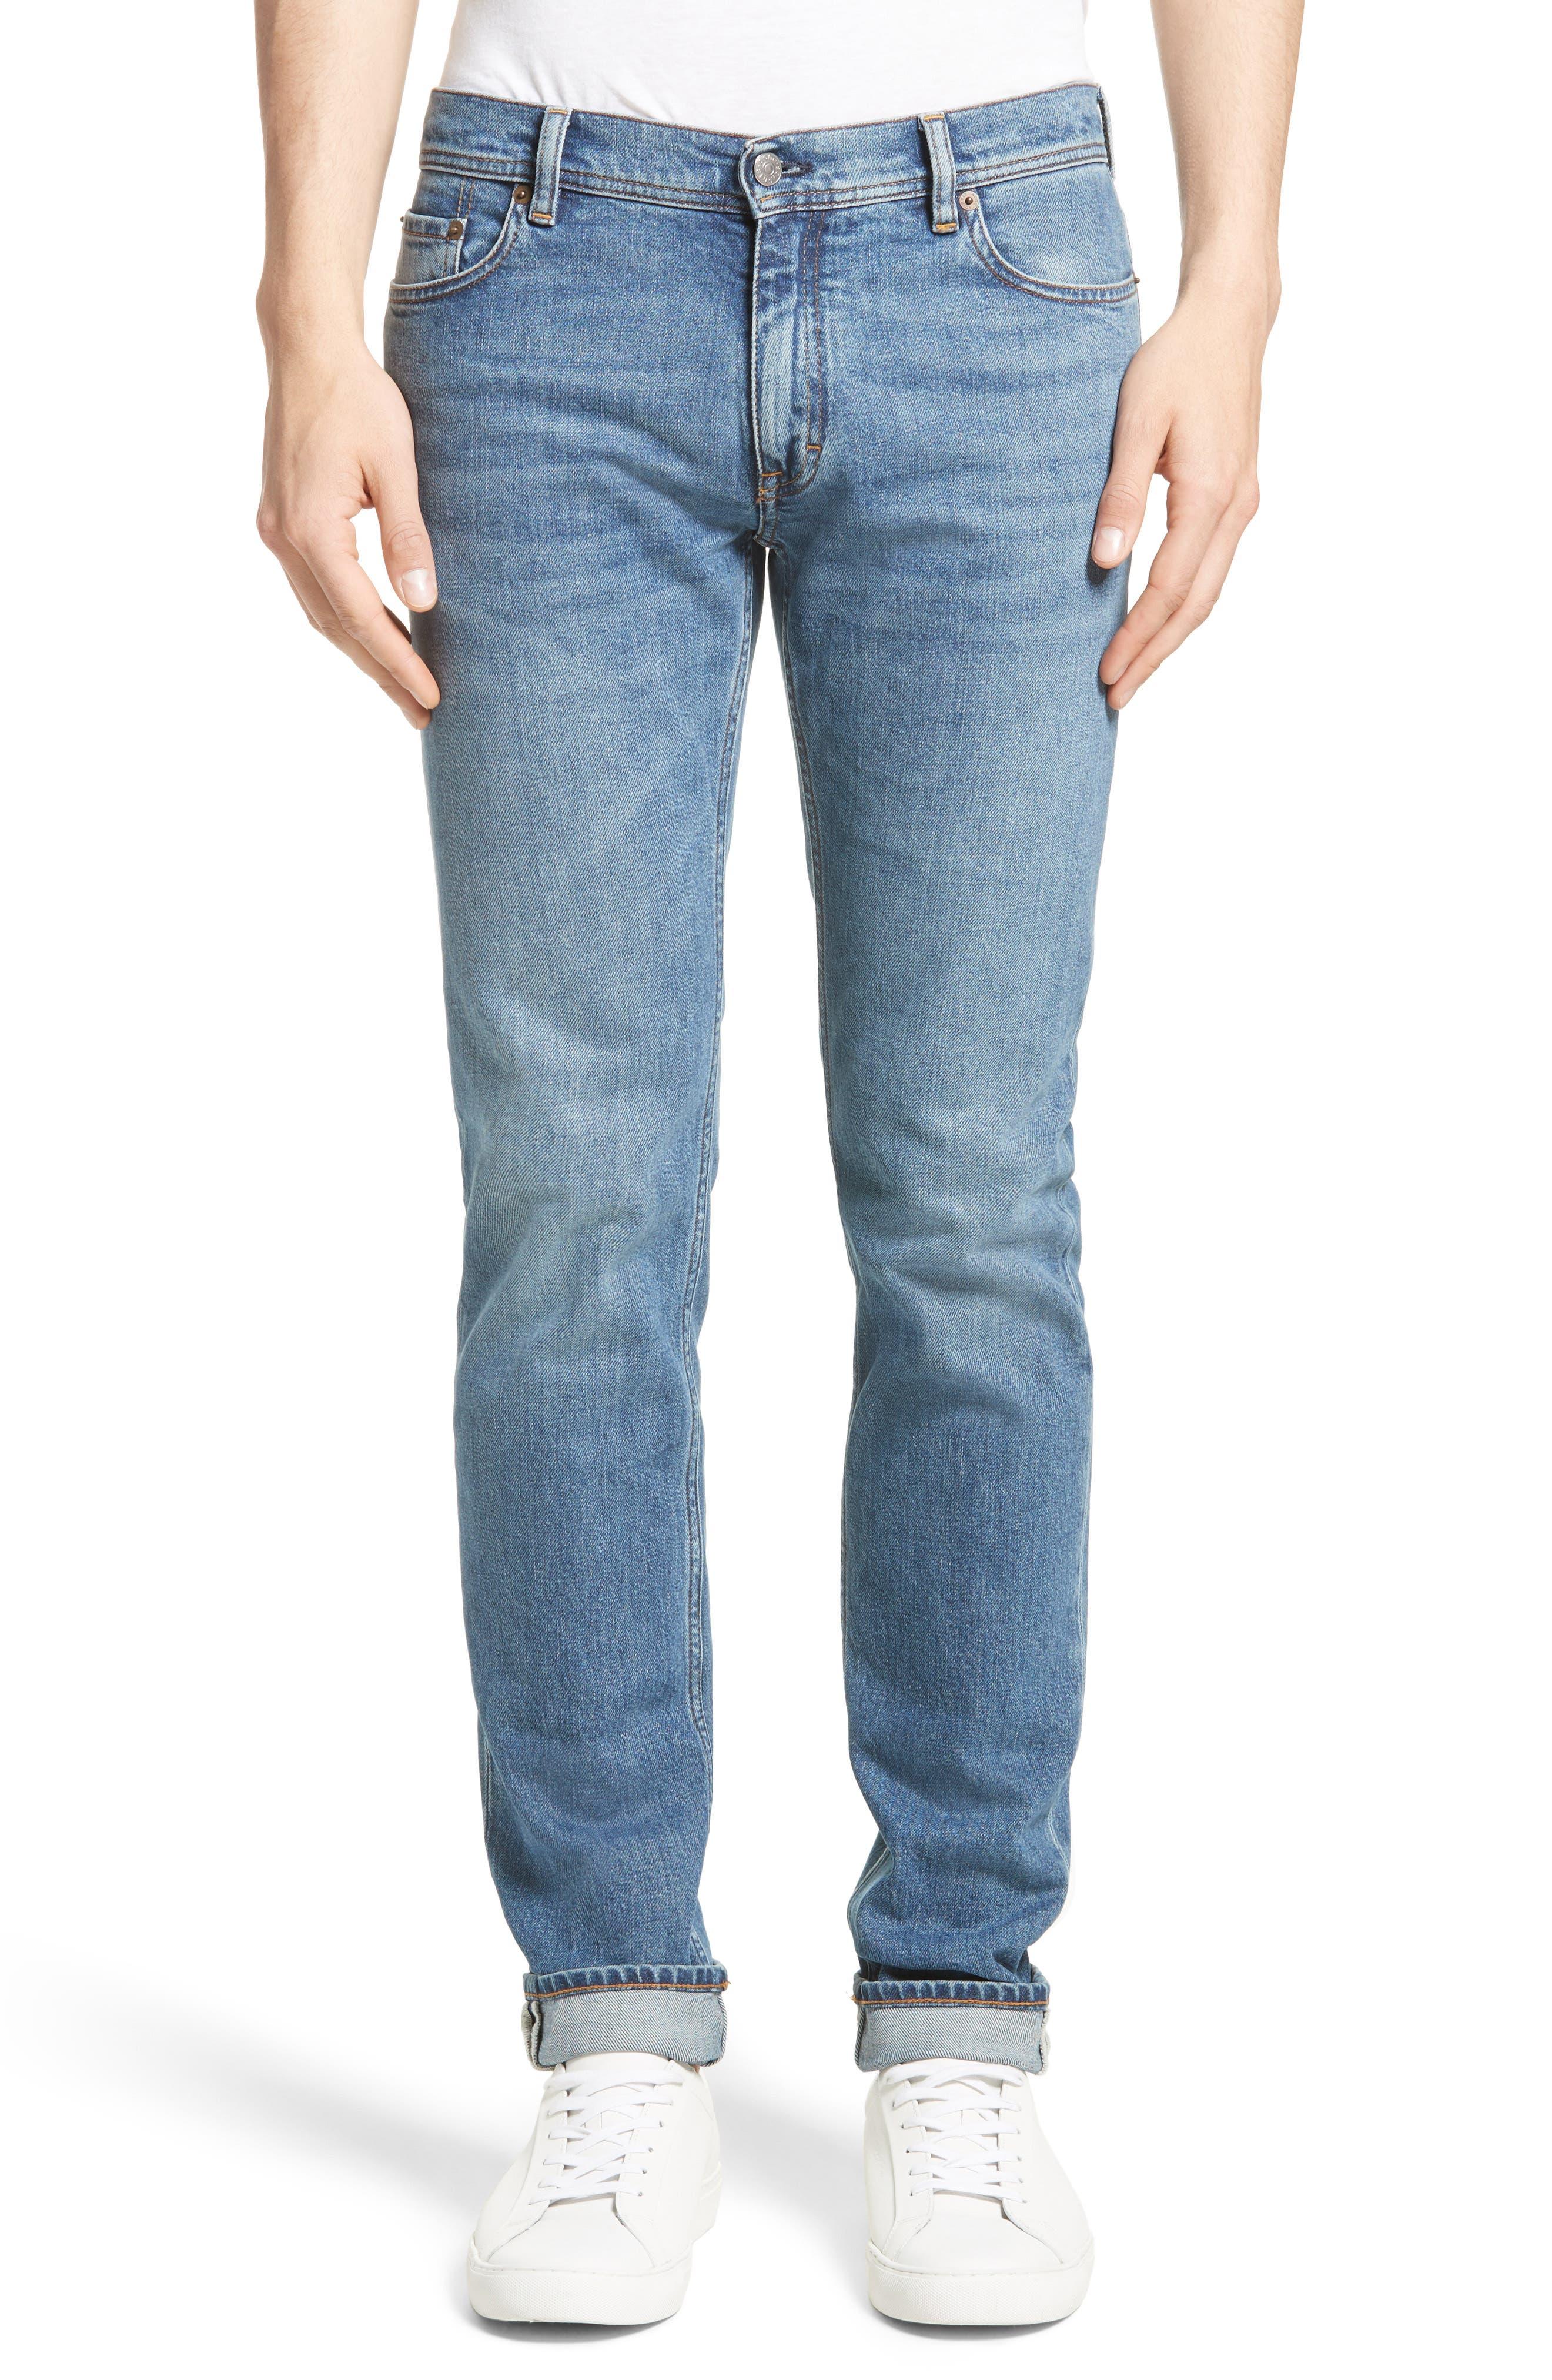 North Skinny Jeans,                             Main thumbnail 1, color,                             420